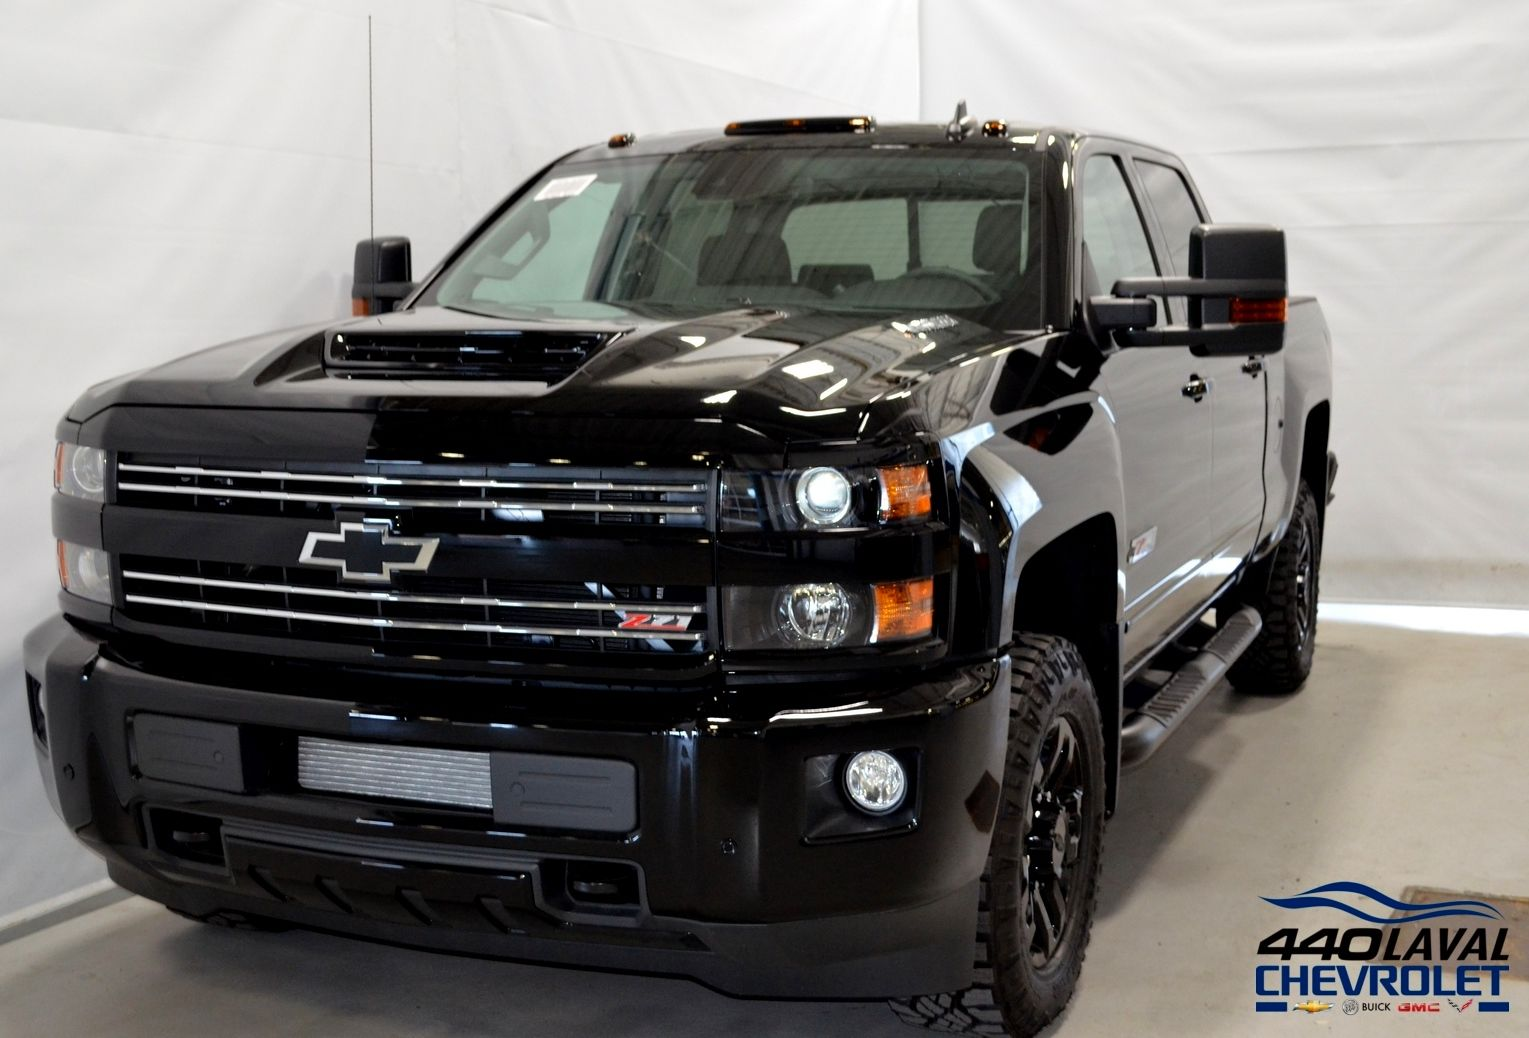 New 2019 Chevrolet Silverado 2500HD LTZ, Z71, Crew Cab, Duramax Black - $87775.0 | 440 Chevrolet ...